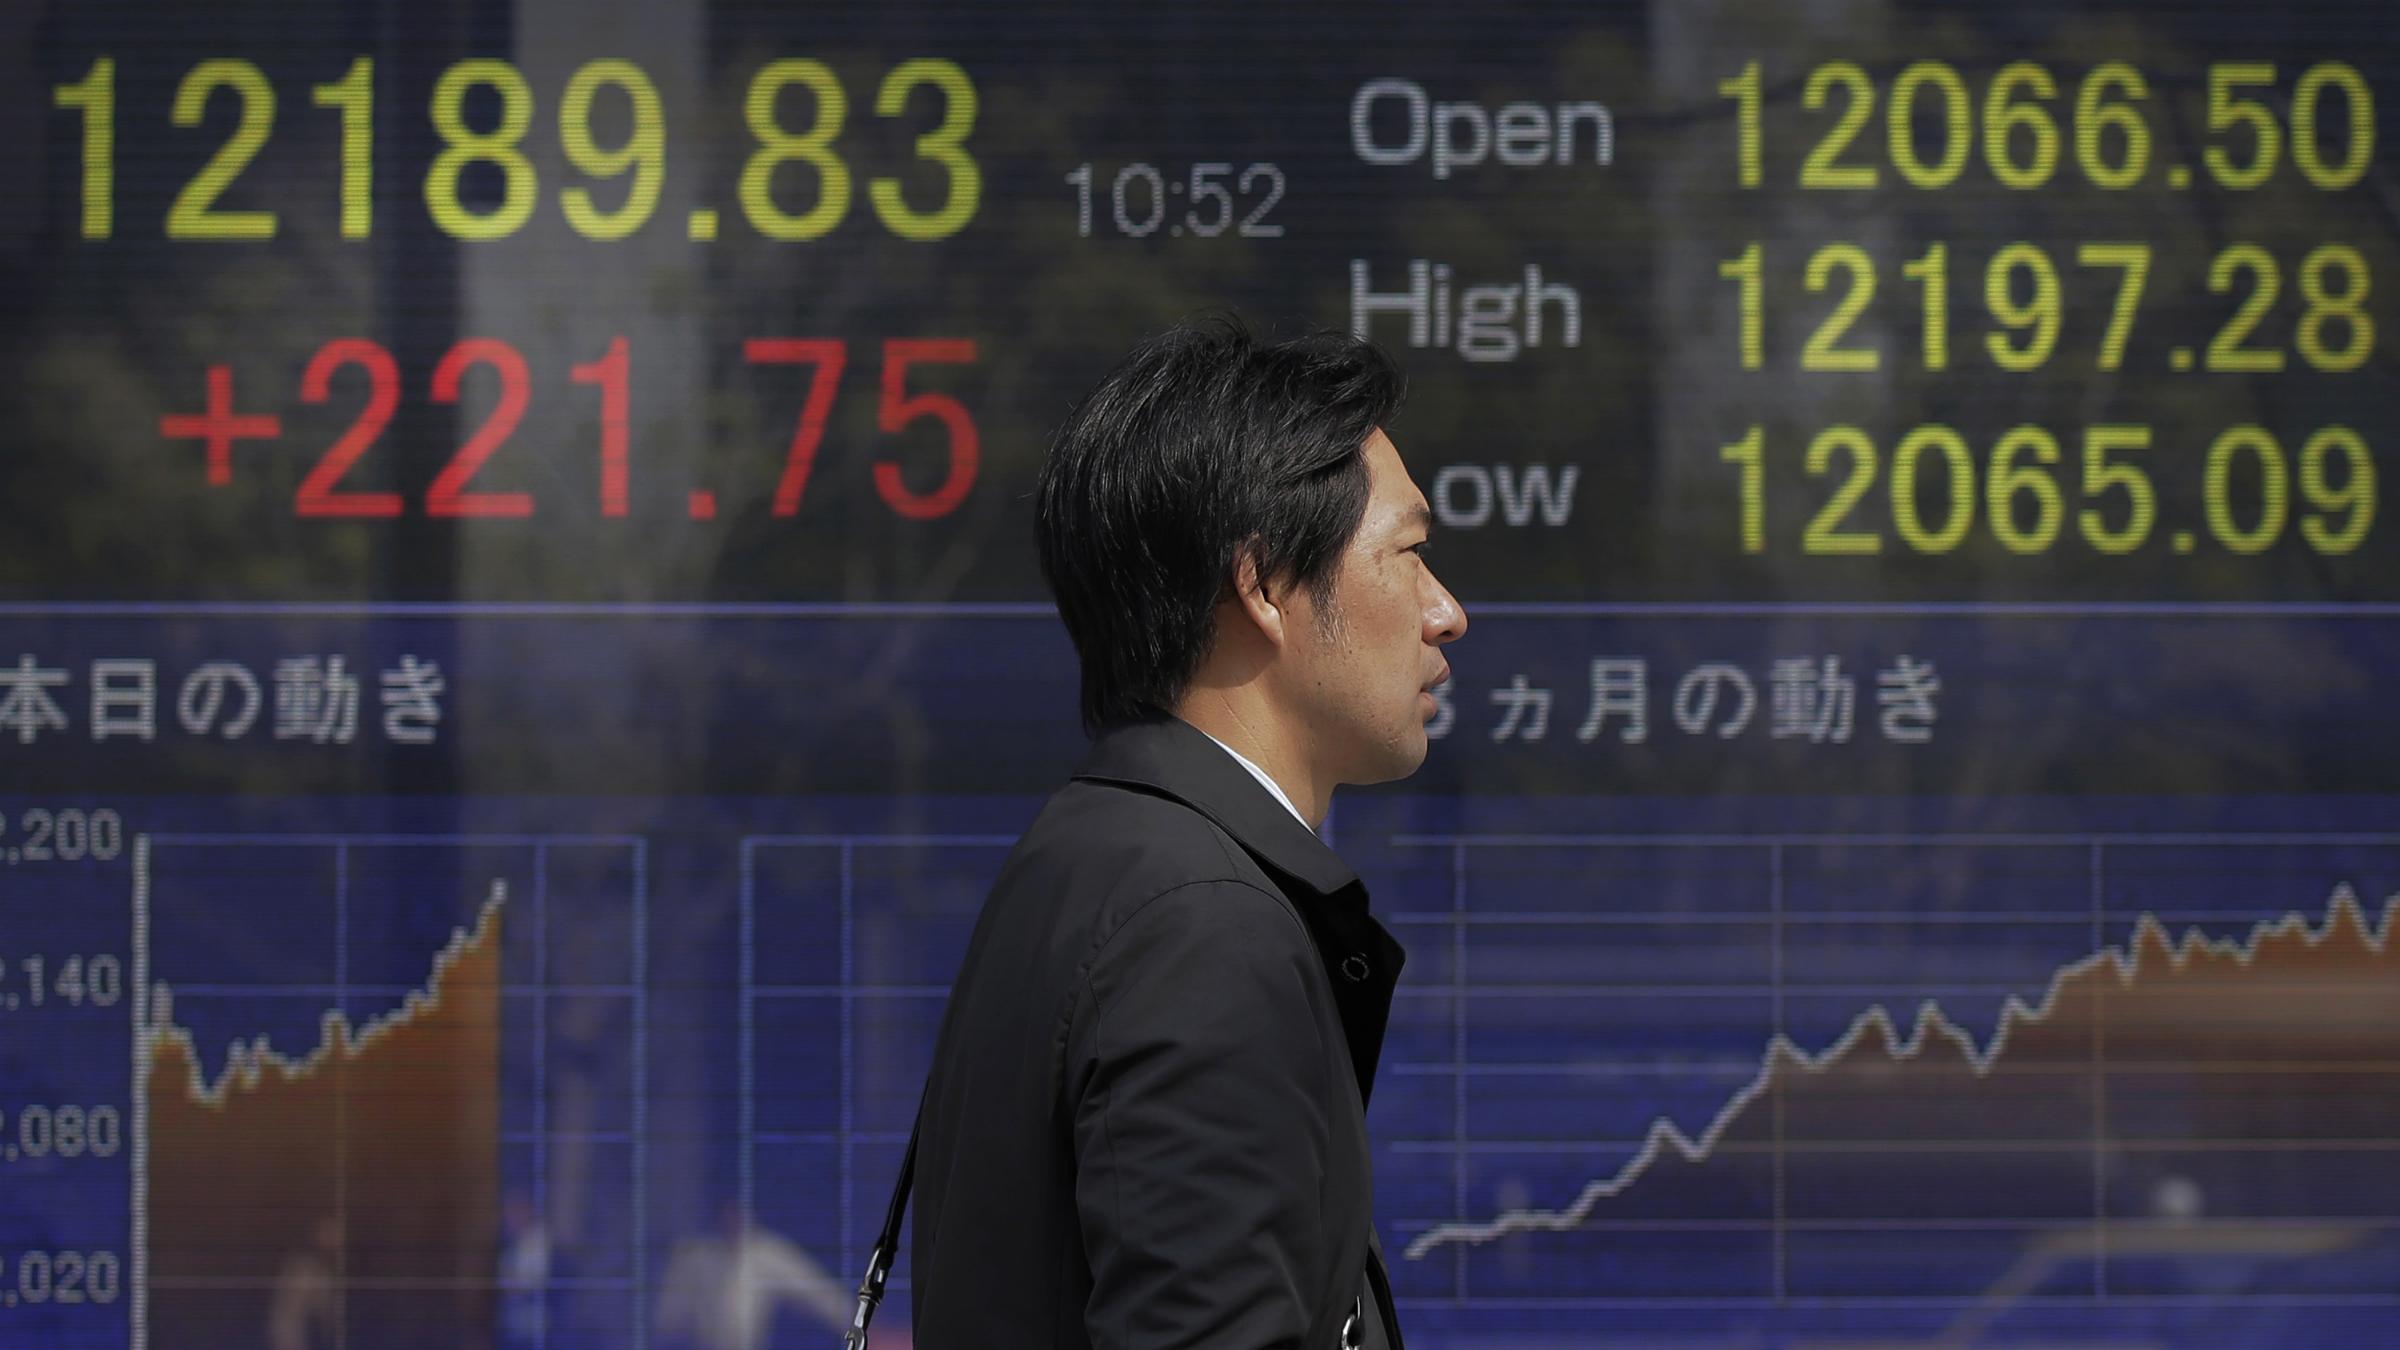 Nikkei Japanese stocks Abenomics Shinzo Abe monetary policy